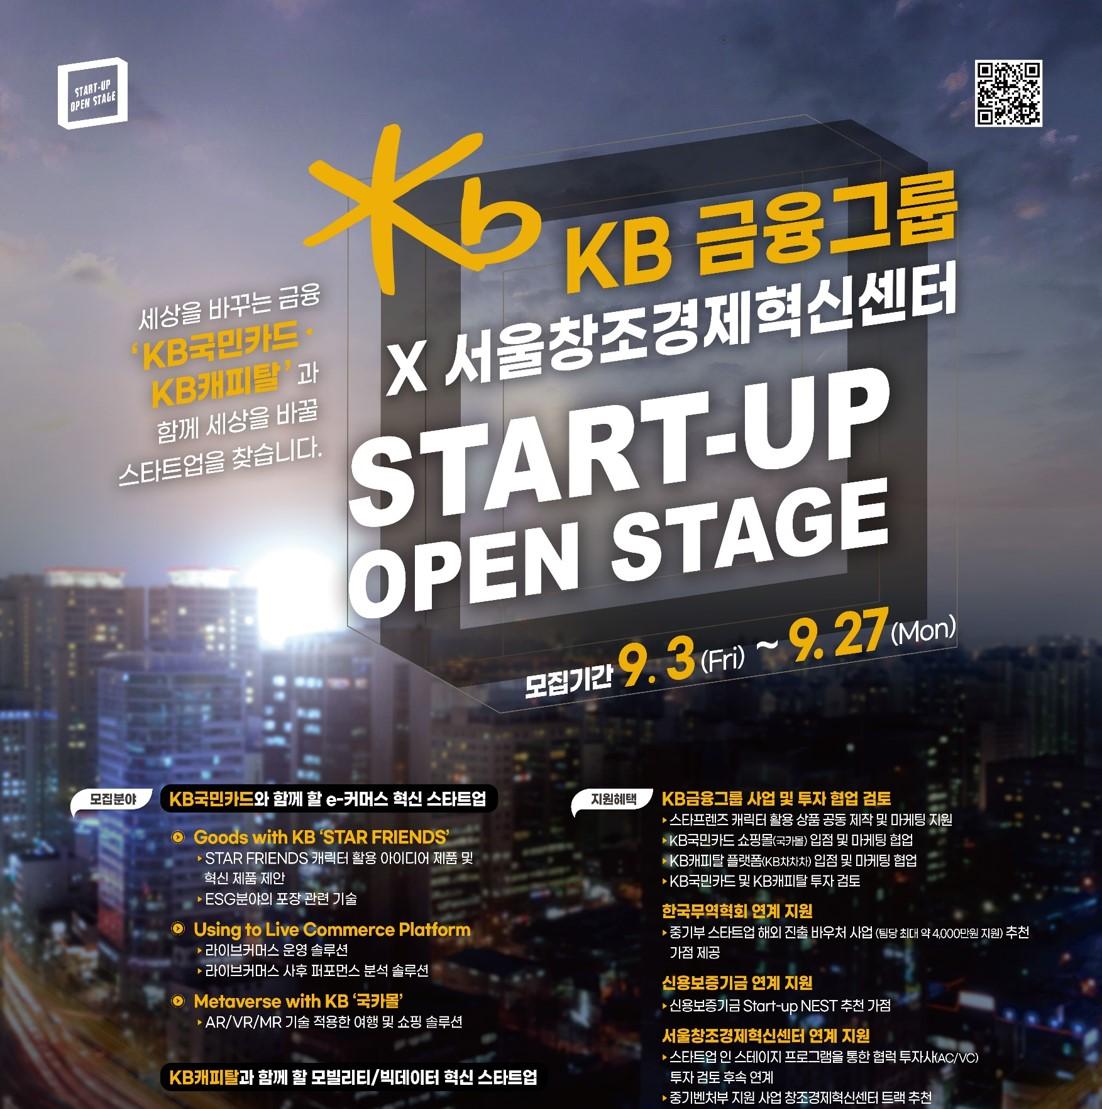 KB금융그룹 x SCCEI 스타트업 오픈 스테이지 밋업